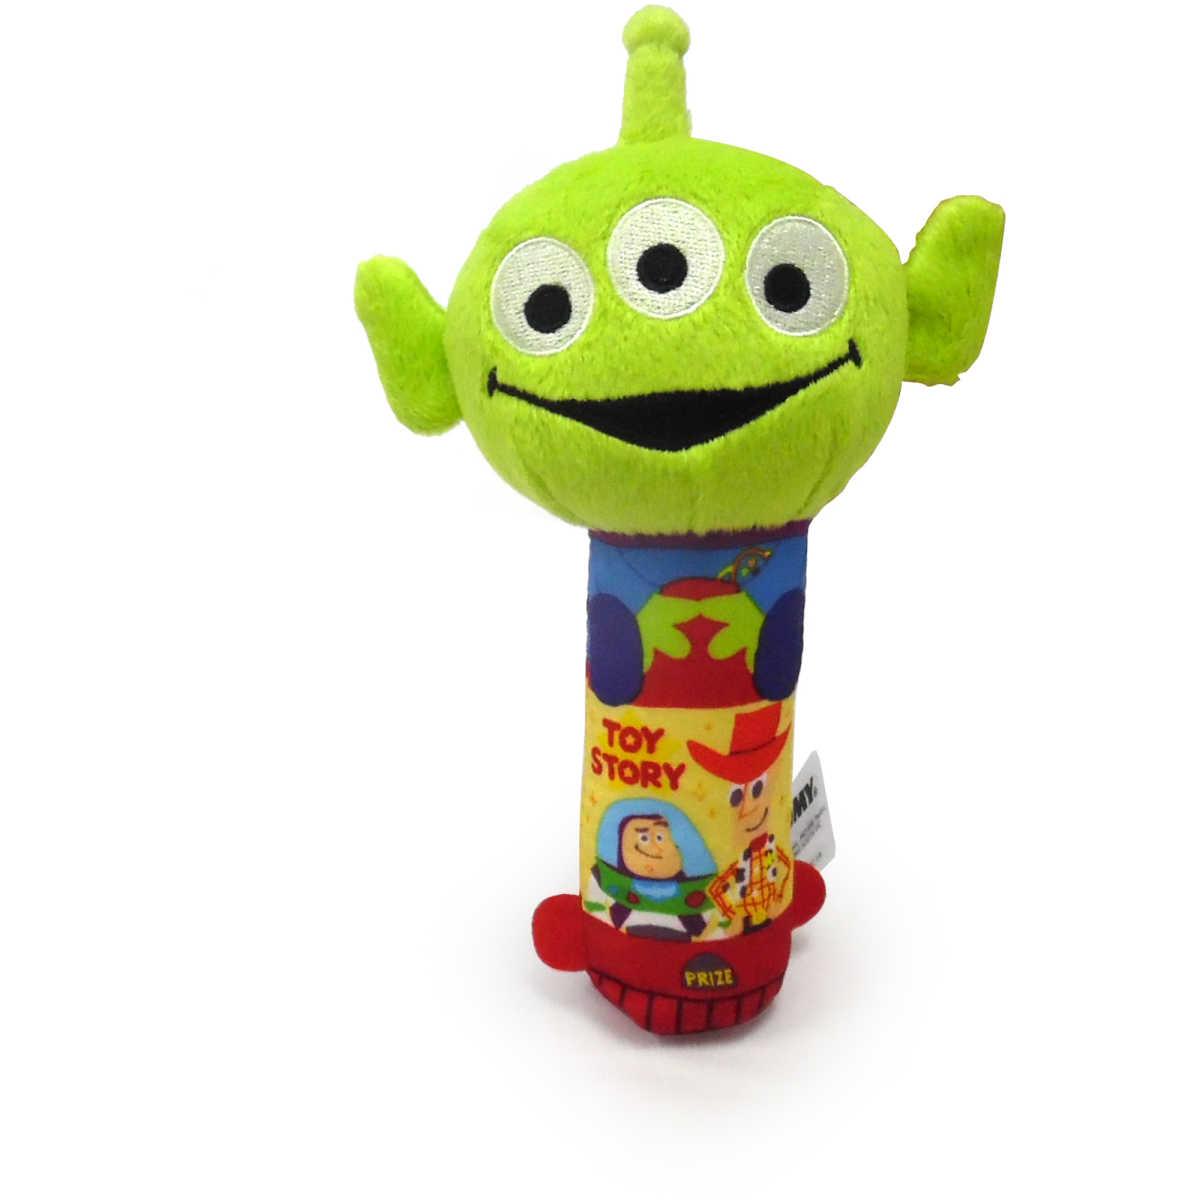 Disney-Nursery-Plush-Alien-Winnie-the-Pooh-Squeaker